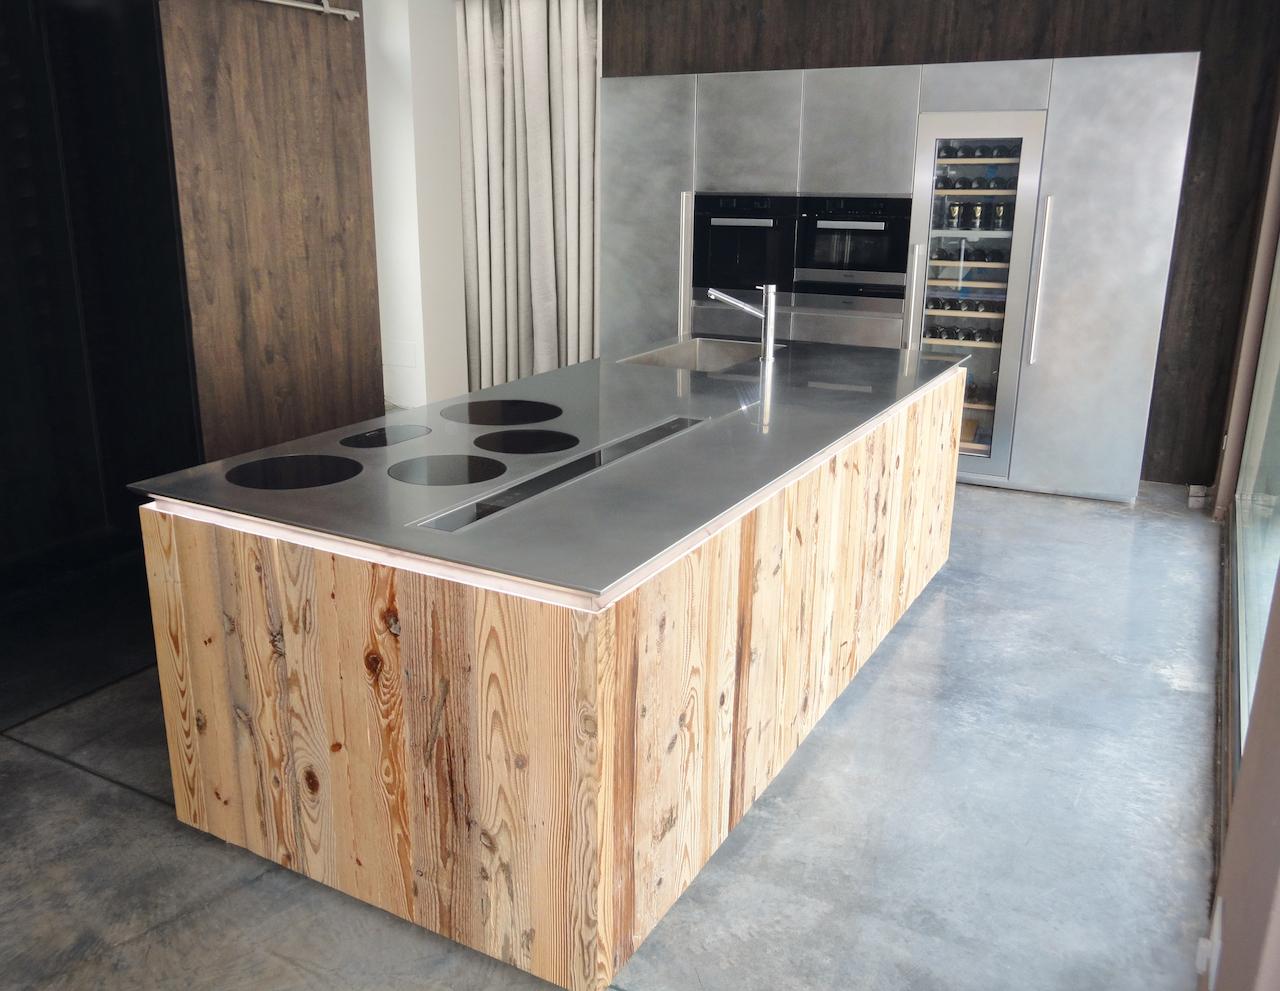 Sala Cucine Cucine Su Misura Cesano Maderno